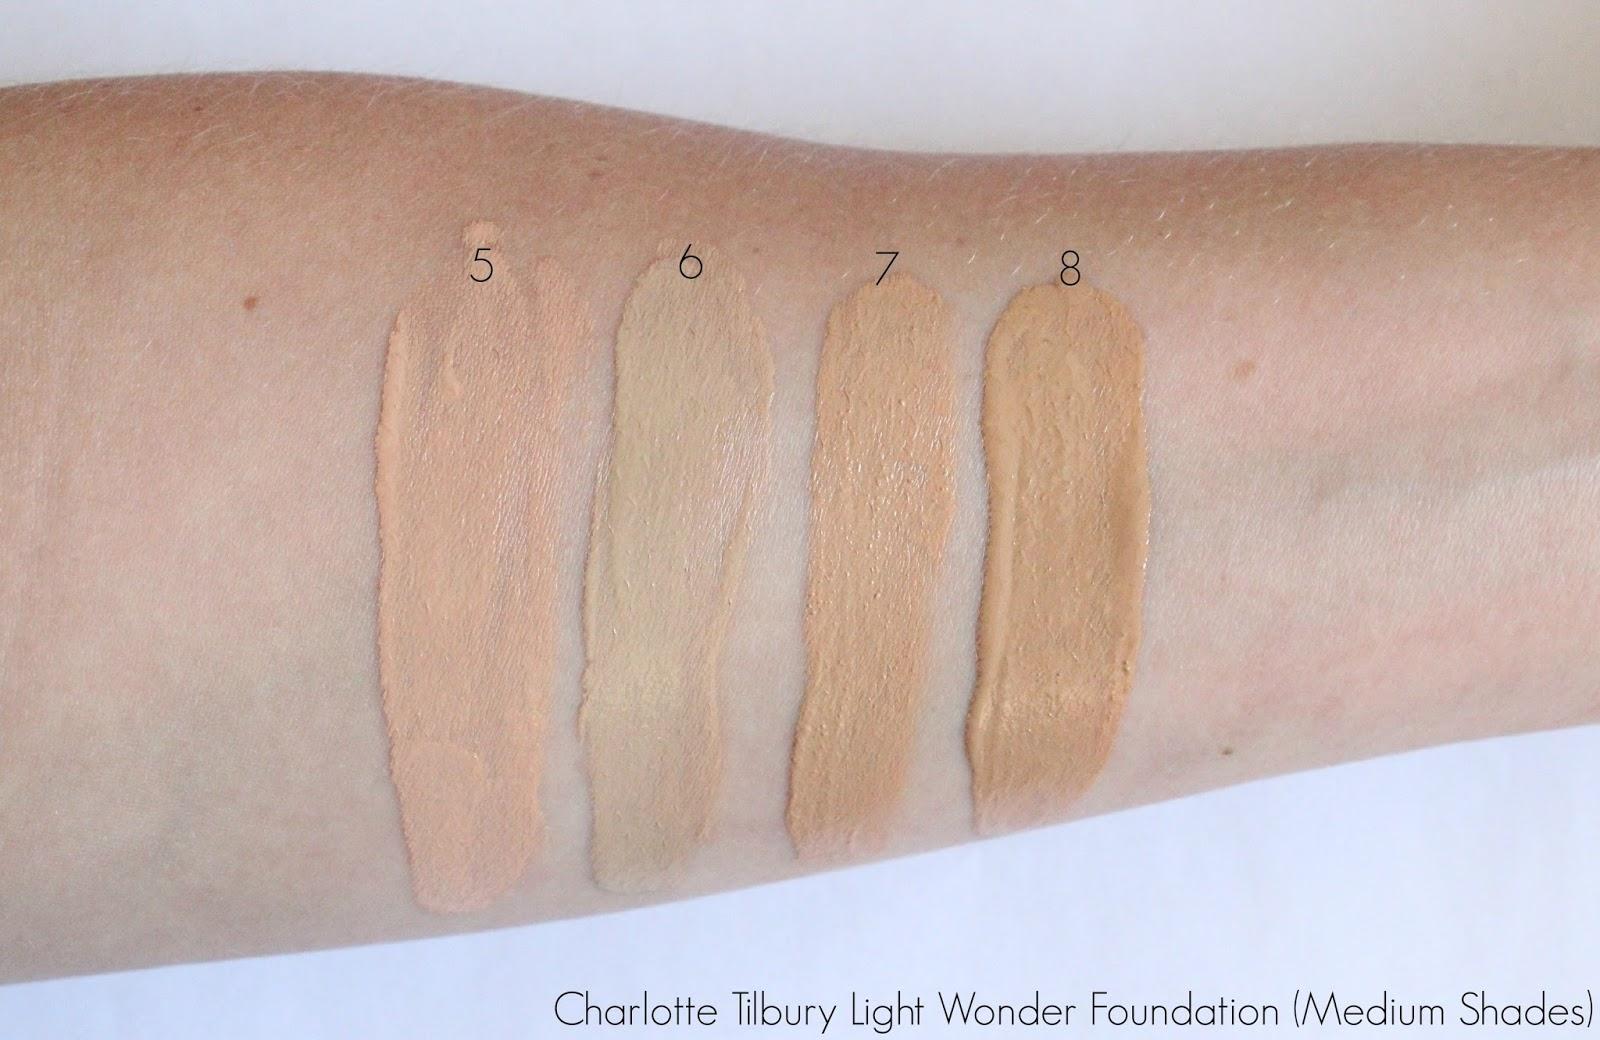 Charlotte Tilbury Light Wonder Foundation Swatches Medium 5, 6, 7, ...